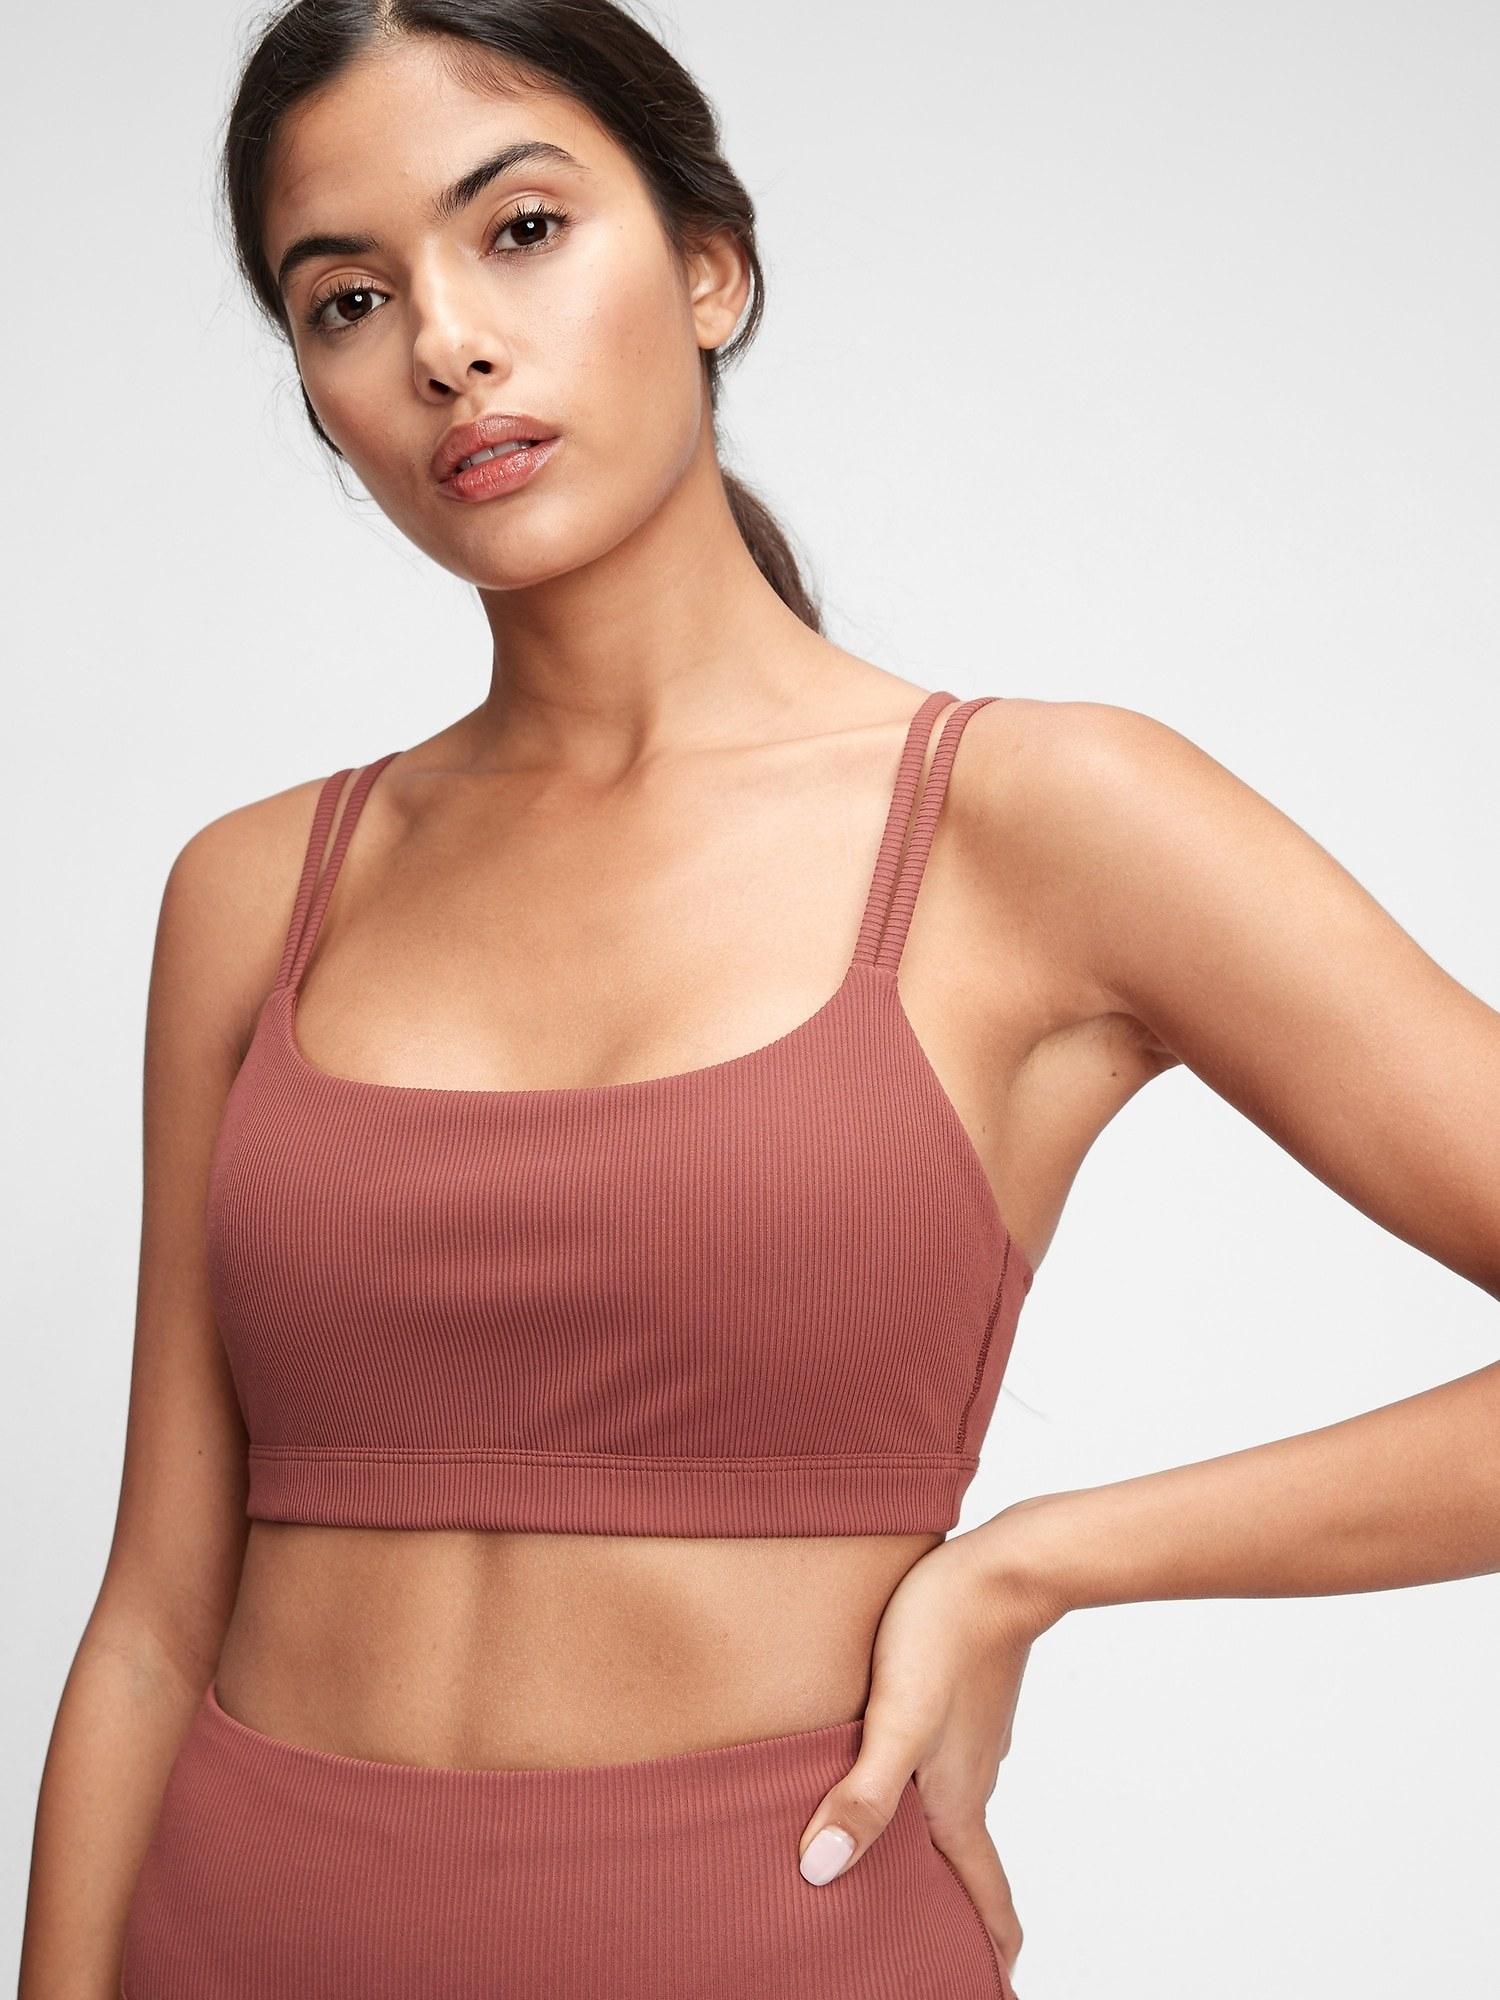 a model wearing the sports bra in pink